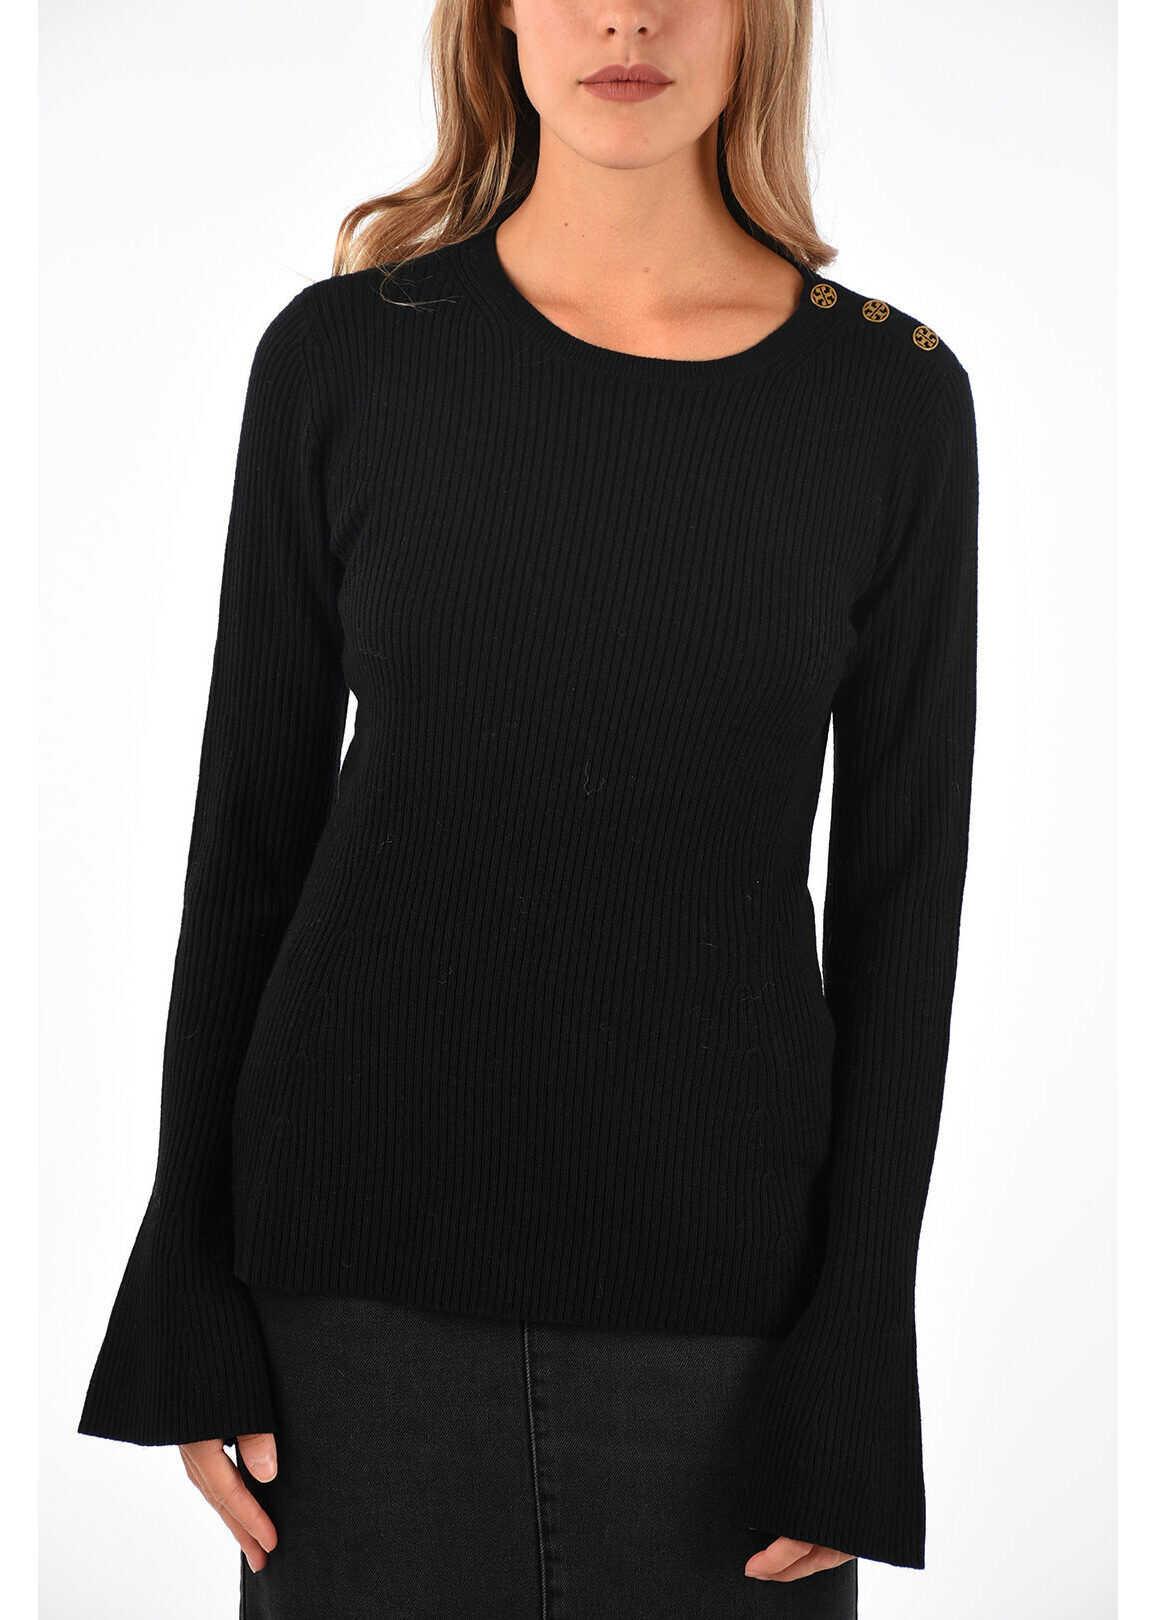 Tory Burch ribbed merino wool Sweater BLACK